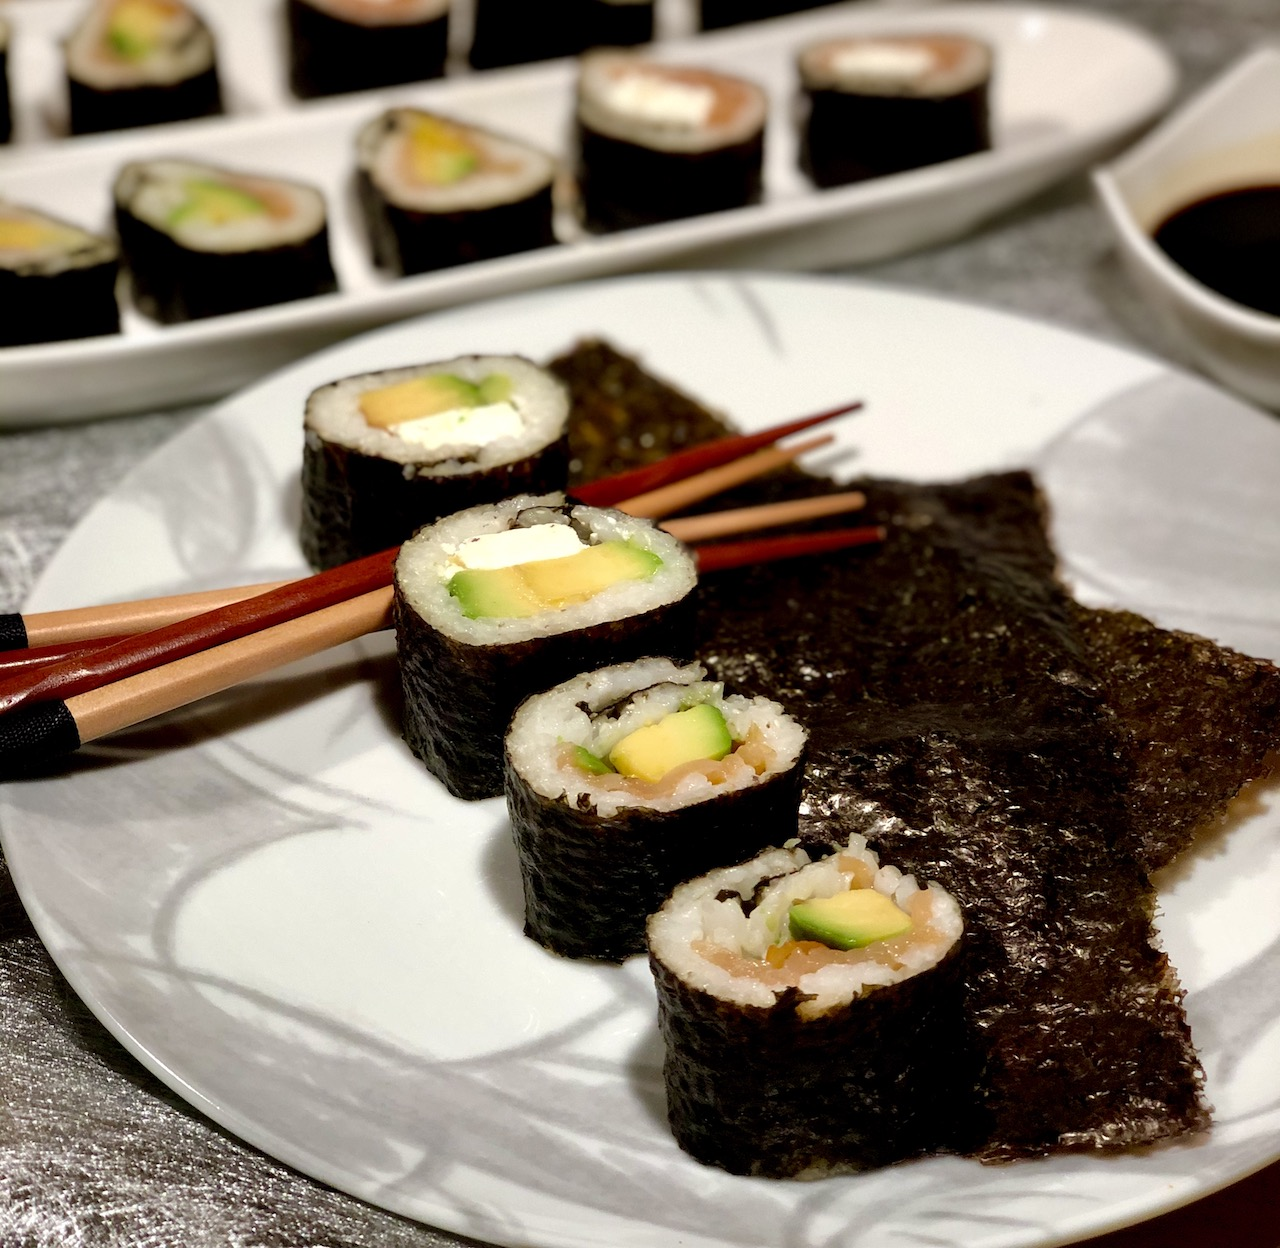 Sushi s feta sirom, z dimljenim lososom in avokadom